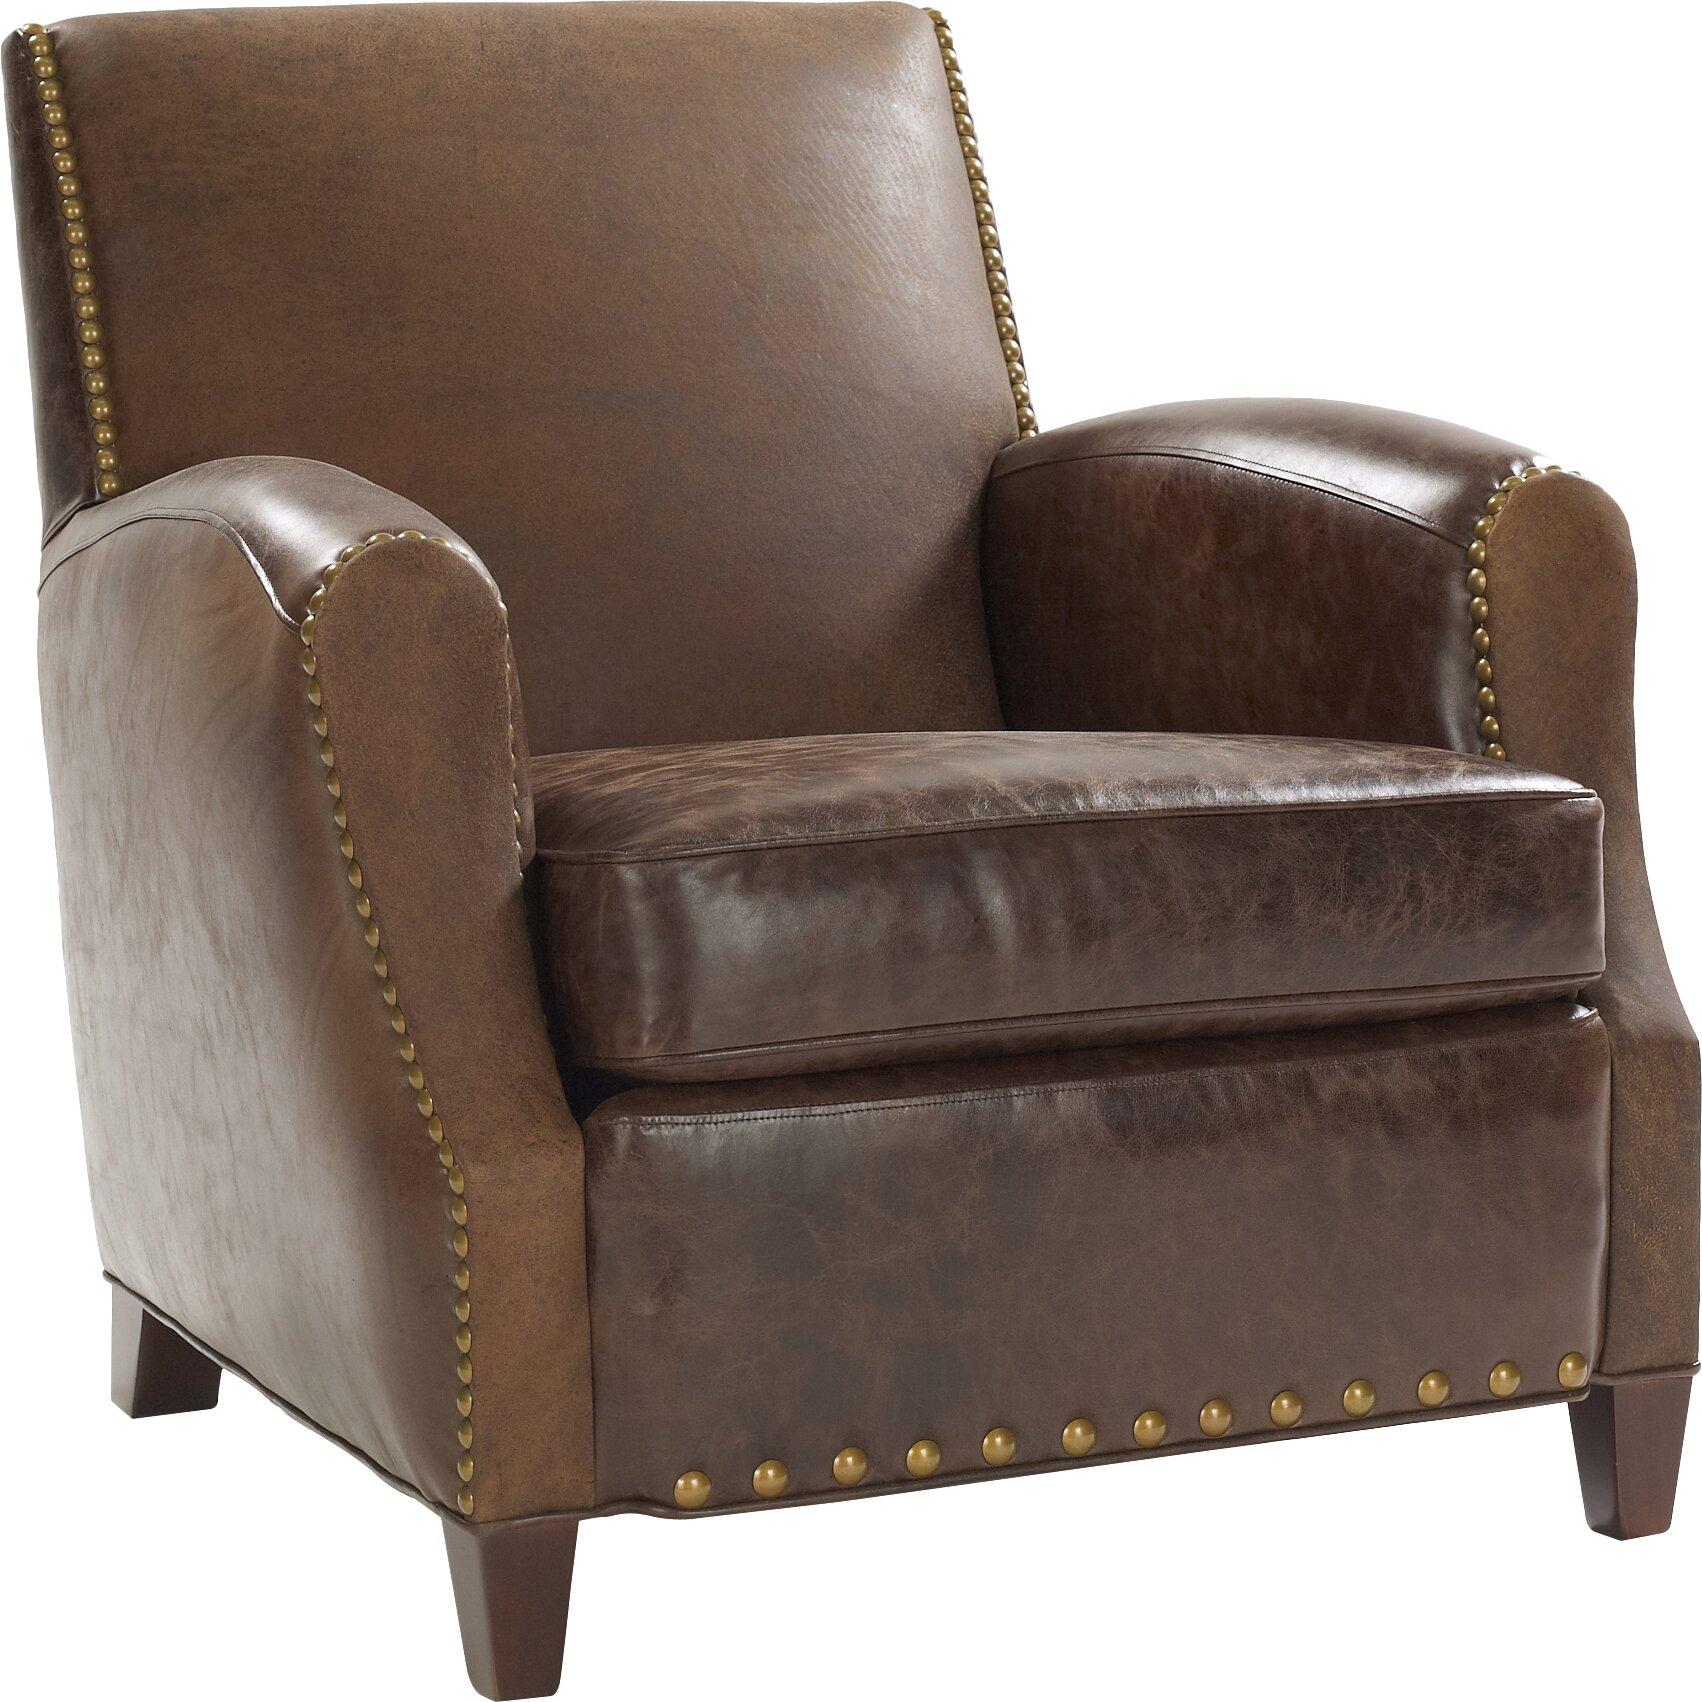 Leathercraft Parisian Leather Chair Wayfair